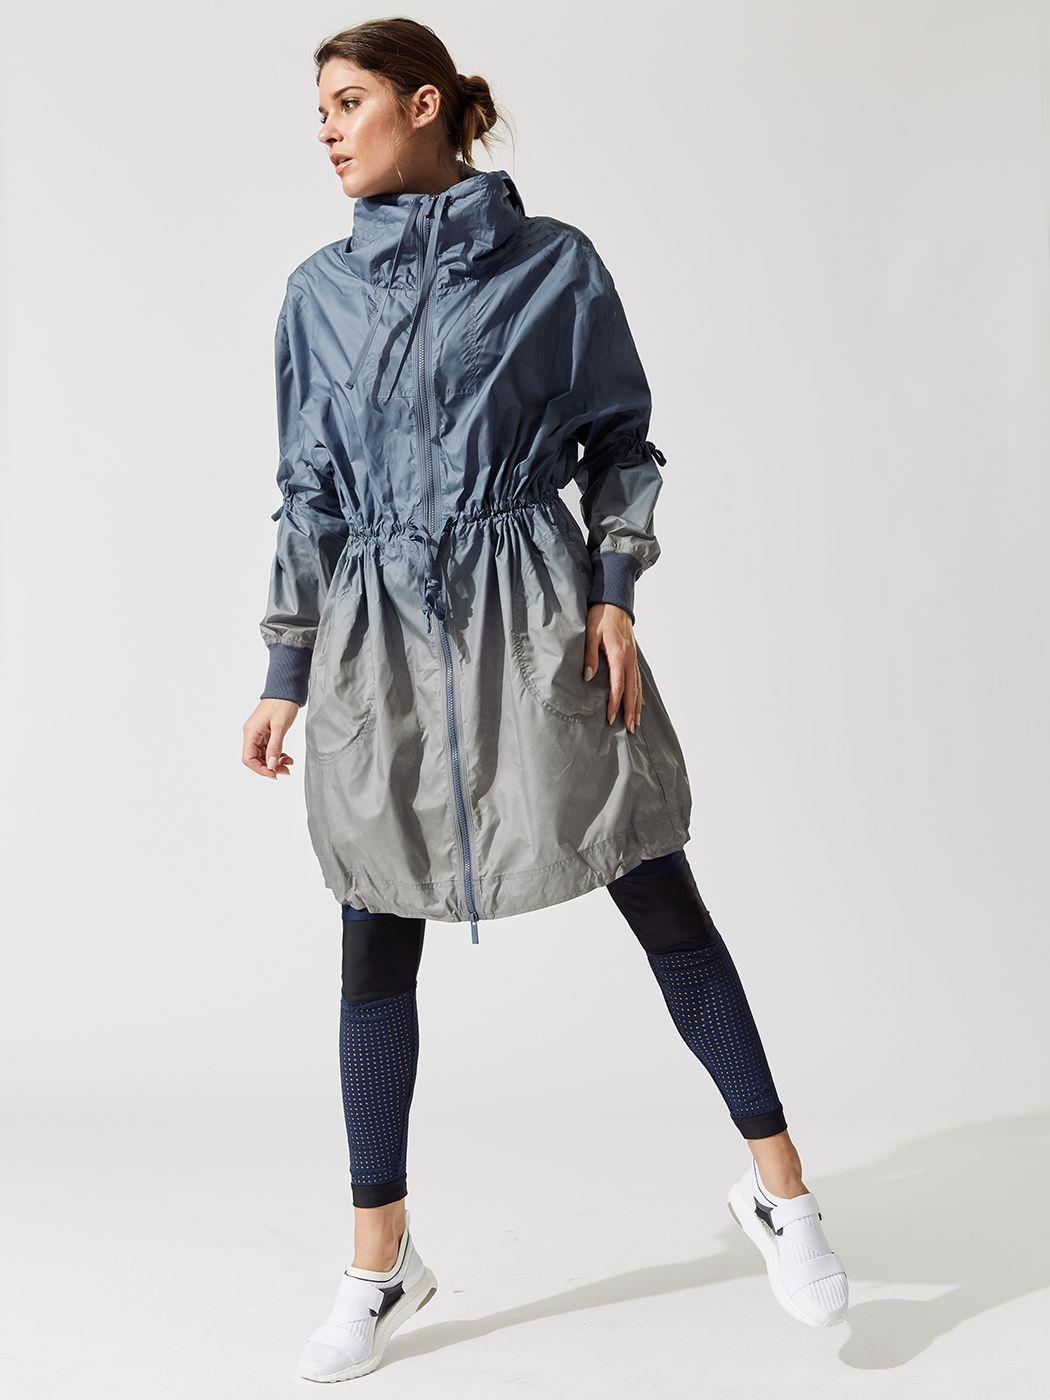 0db3d5dfc792e Train Parka | Activewear | Parka, Stella mccartney adidas, Jackets